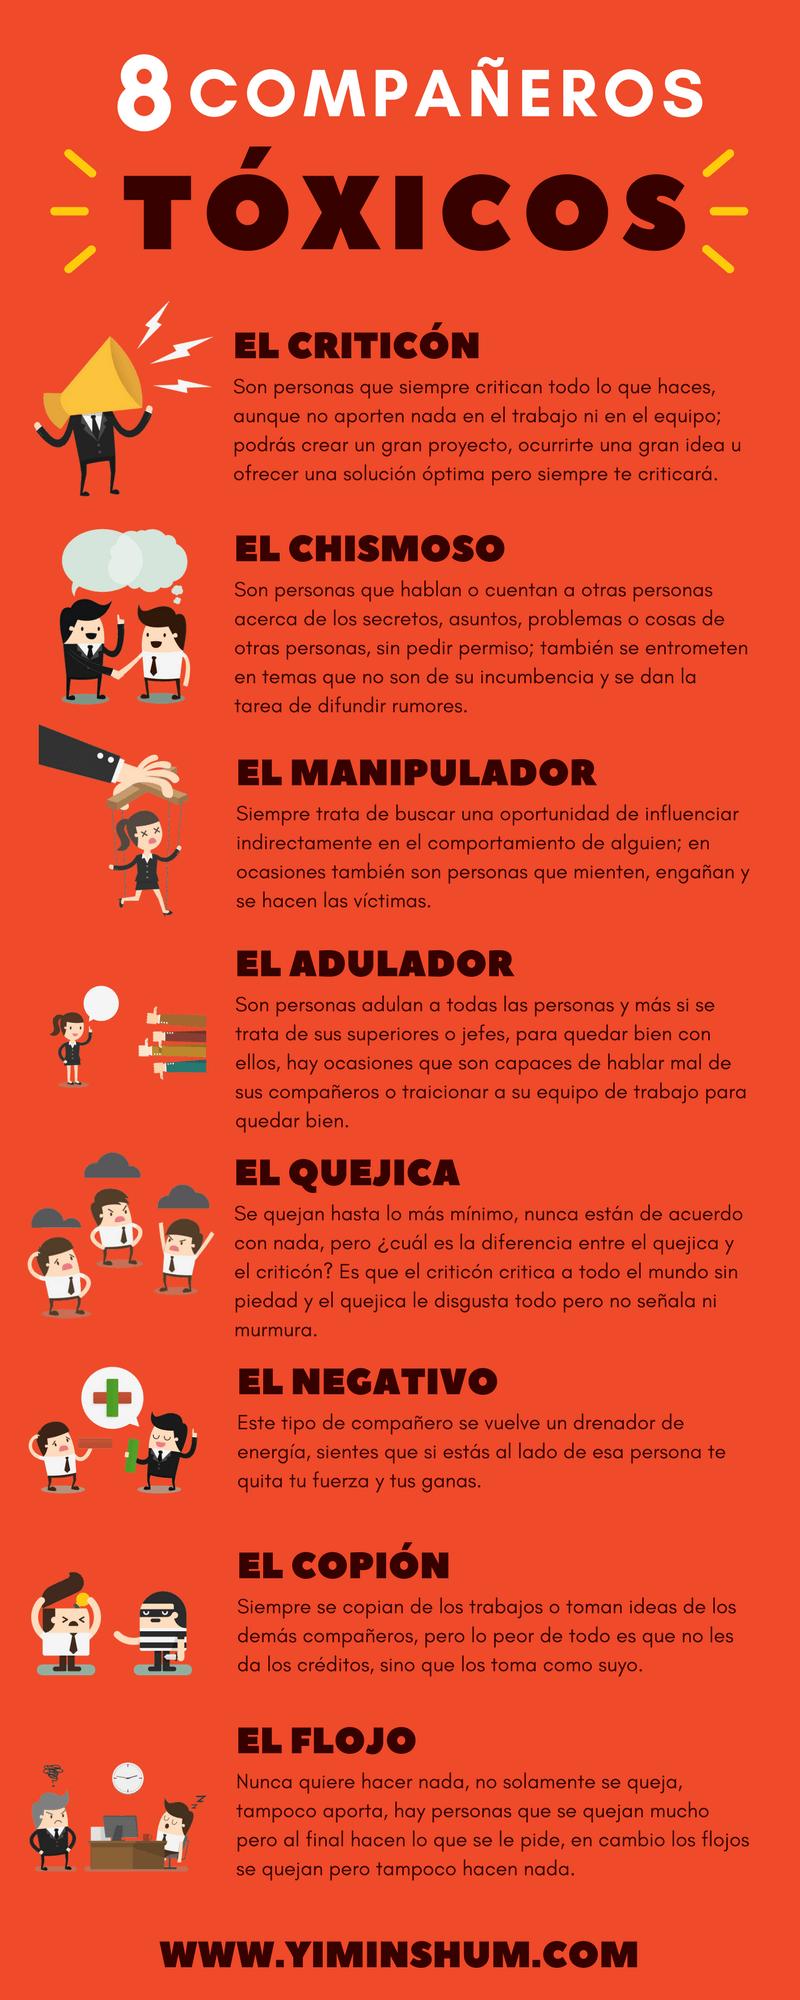 8 compañeros tóxicos infografía imagen